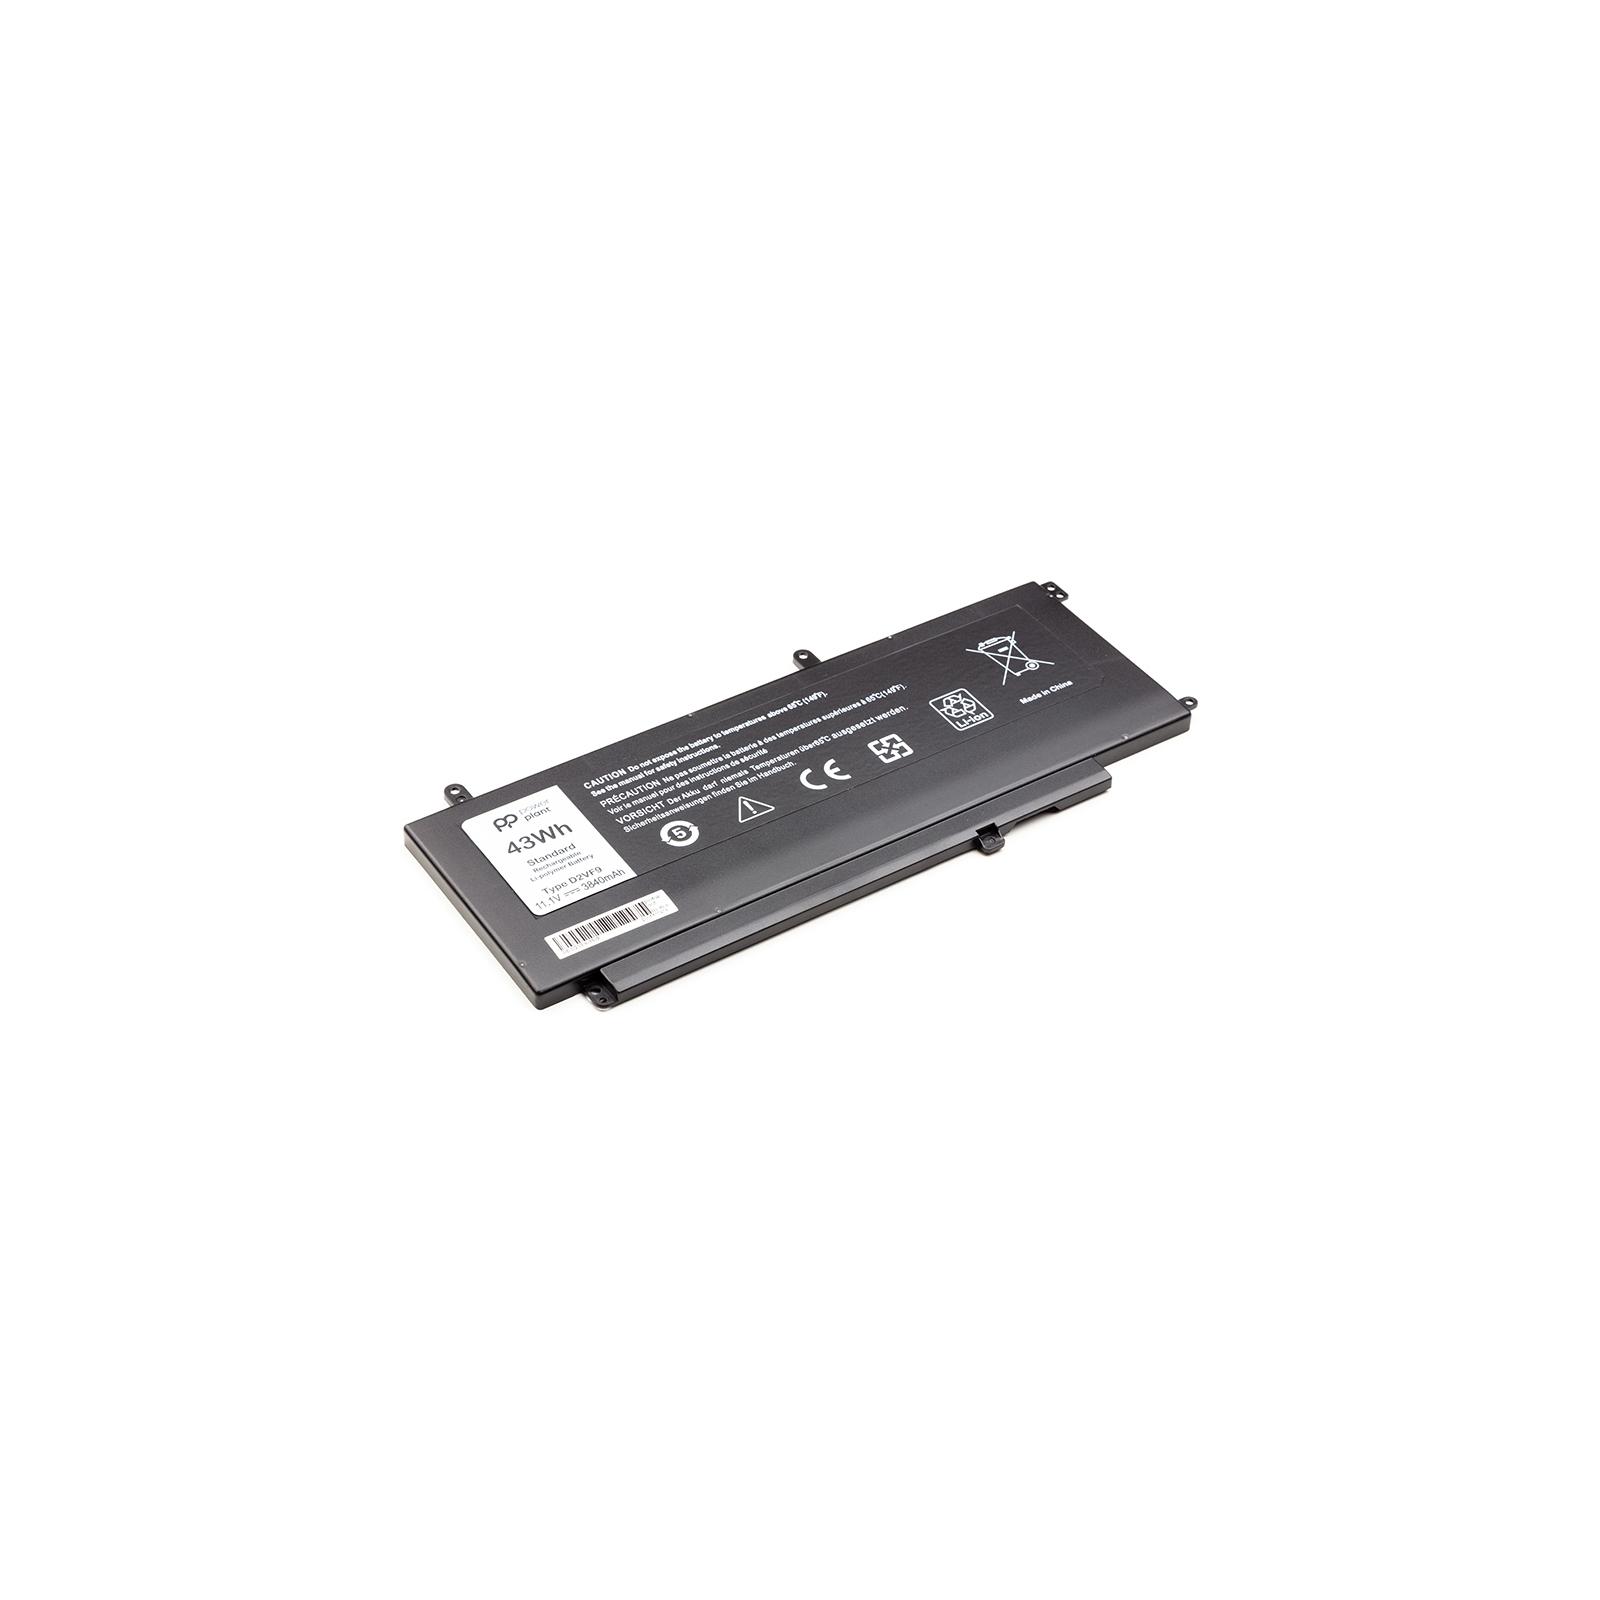 Аккумулятор для ноутбука DELL Inspiron 15 7547 (D2VF9) 11.1V 3840mAh PowerPlant (NB441112) изображение 2